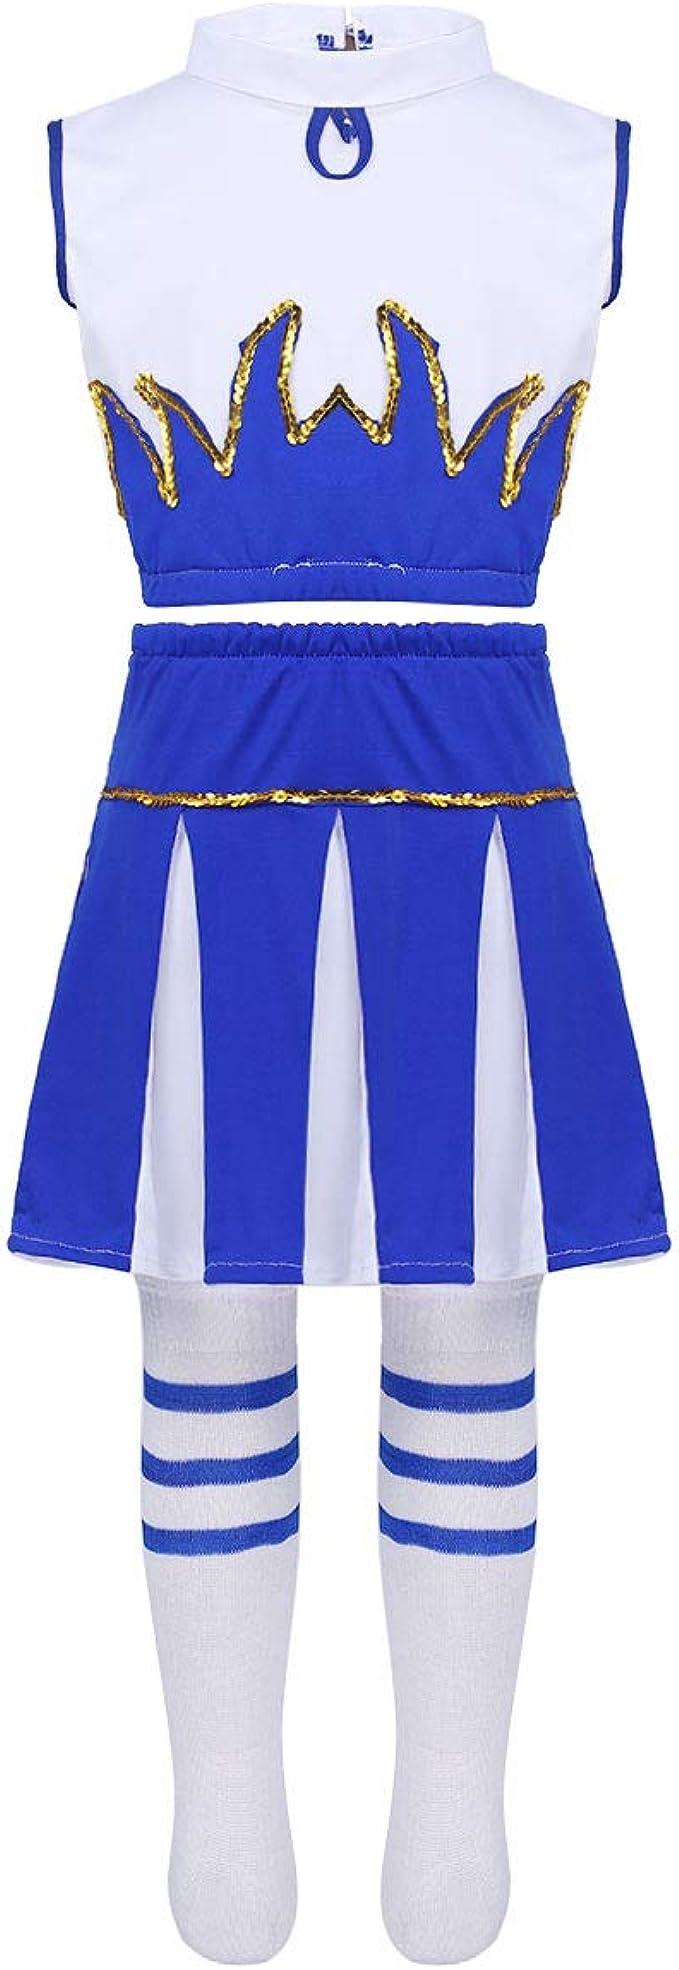 iixpin 3Pcs Disfraces de Animadora Fútibol Tenis Baloncesto Niñas ...